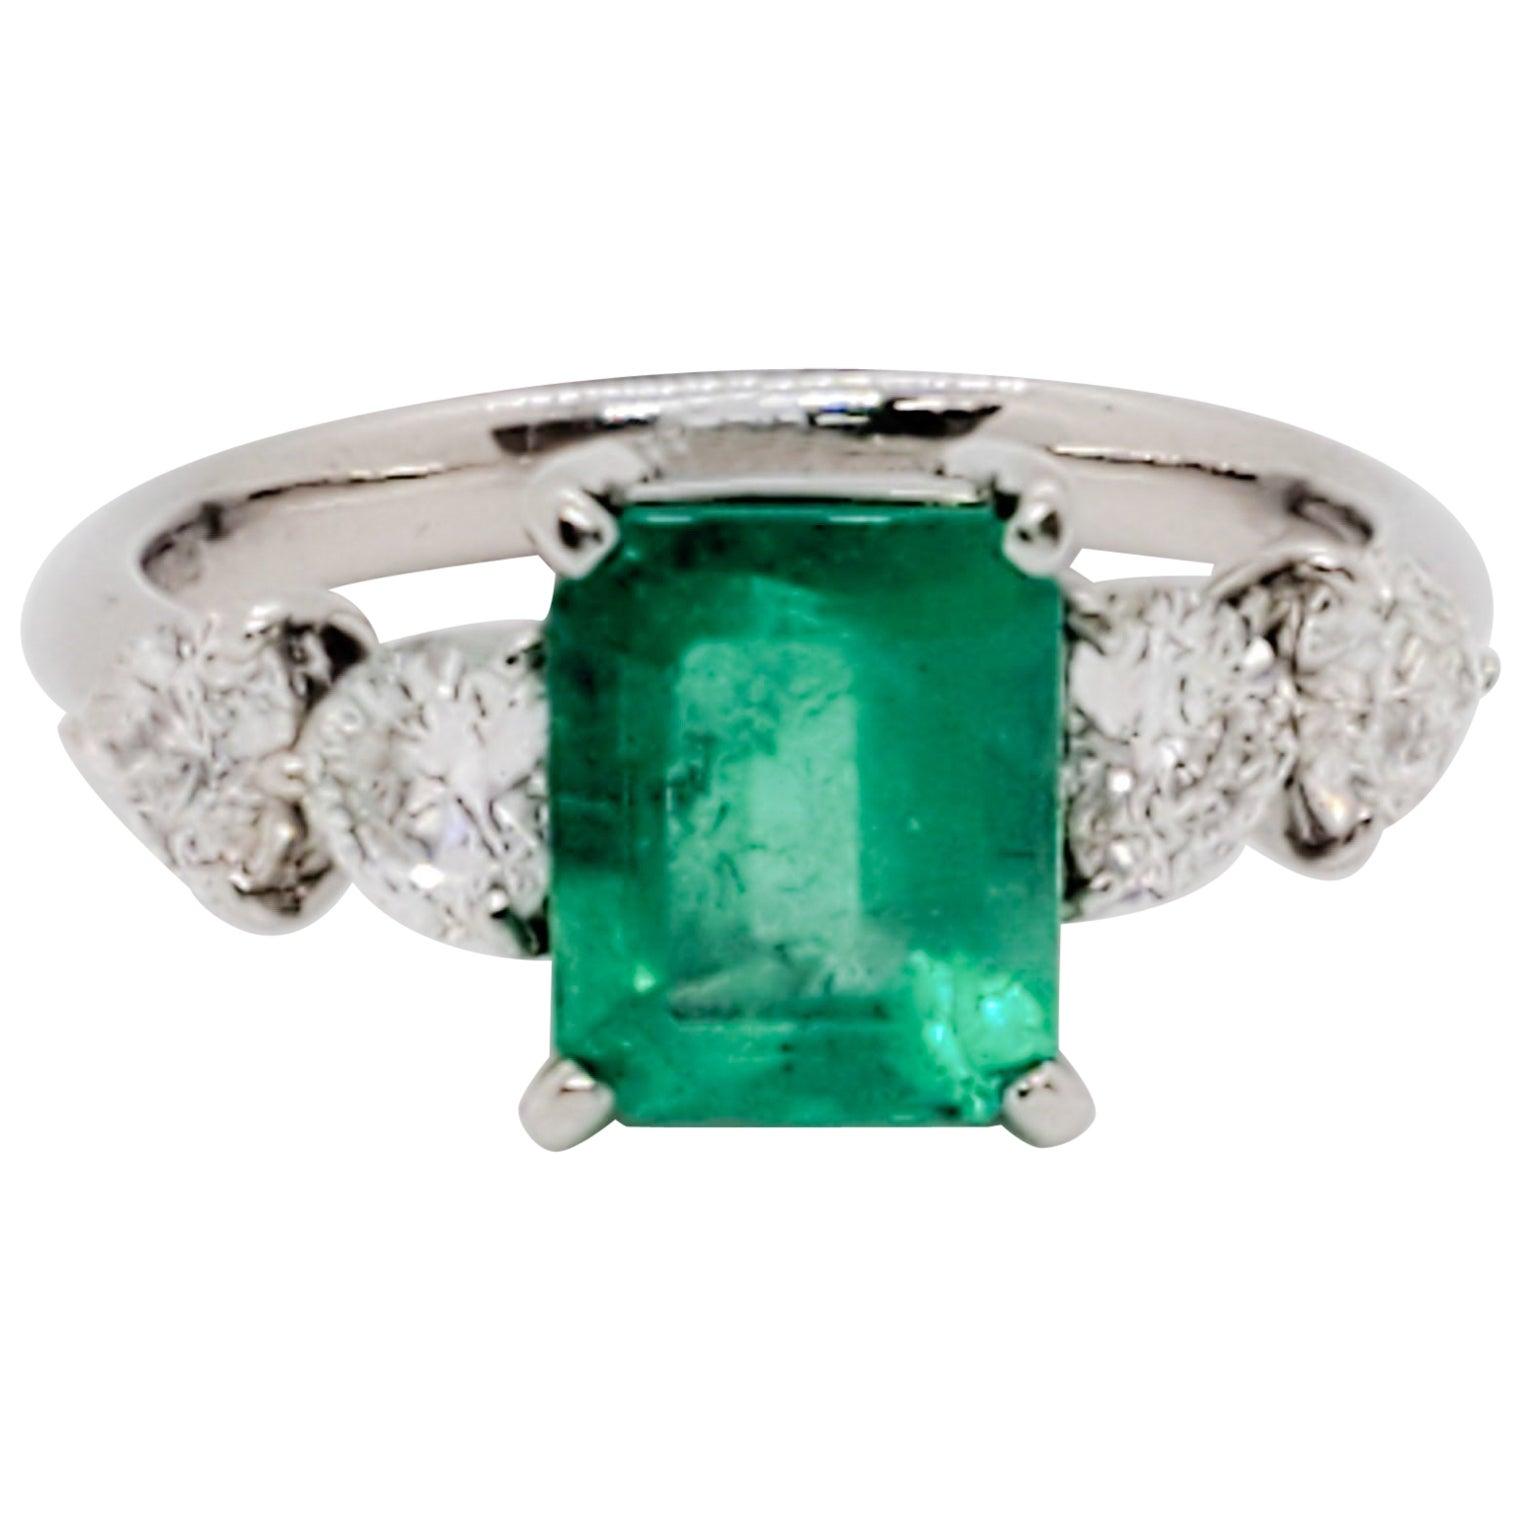 Emerald Emerald Cut and White Diamond Heart Ring in Platinum